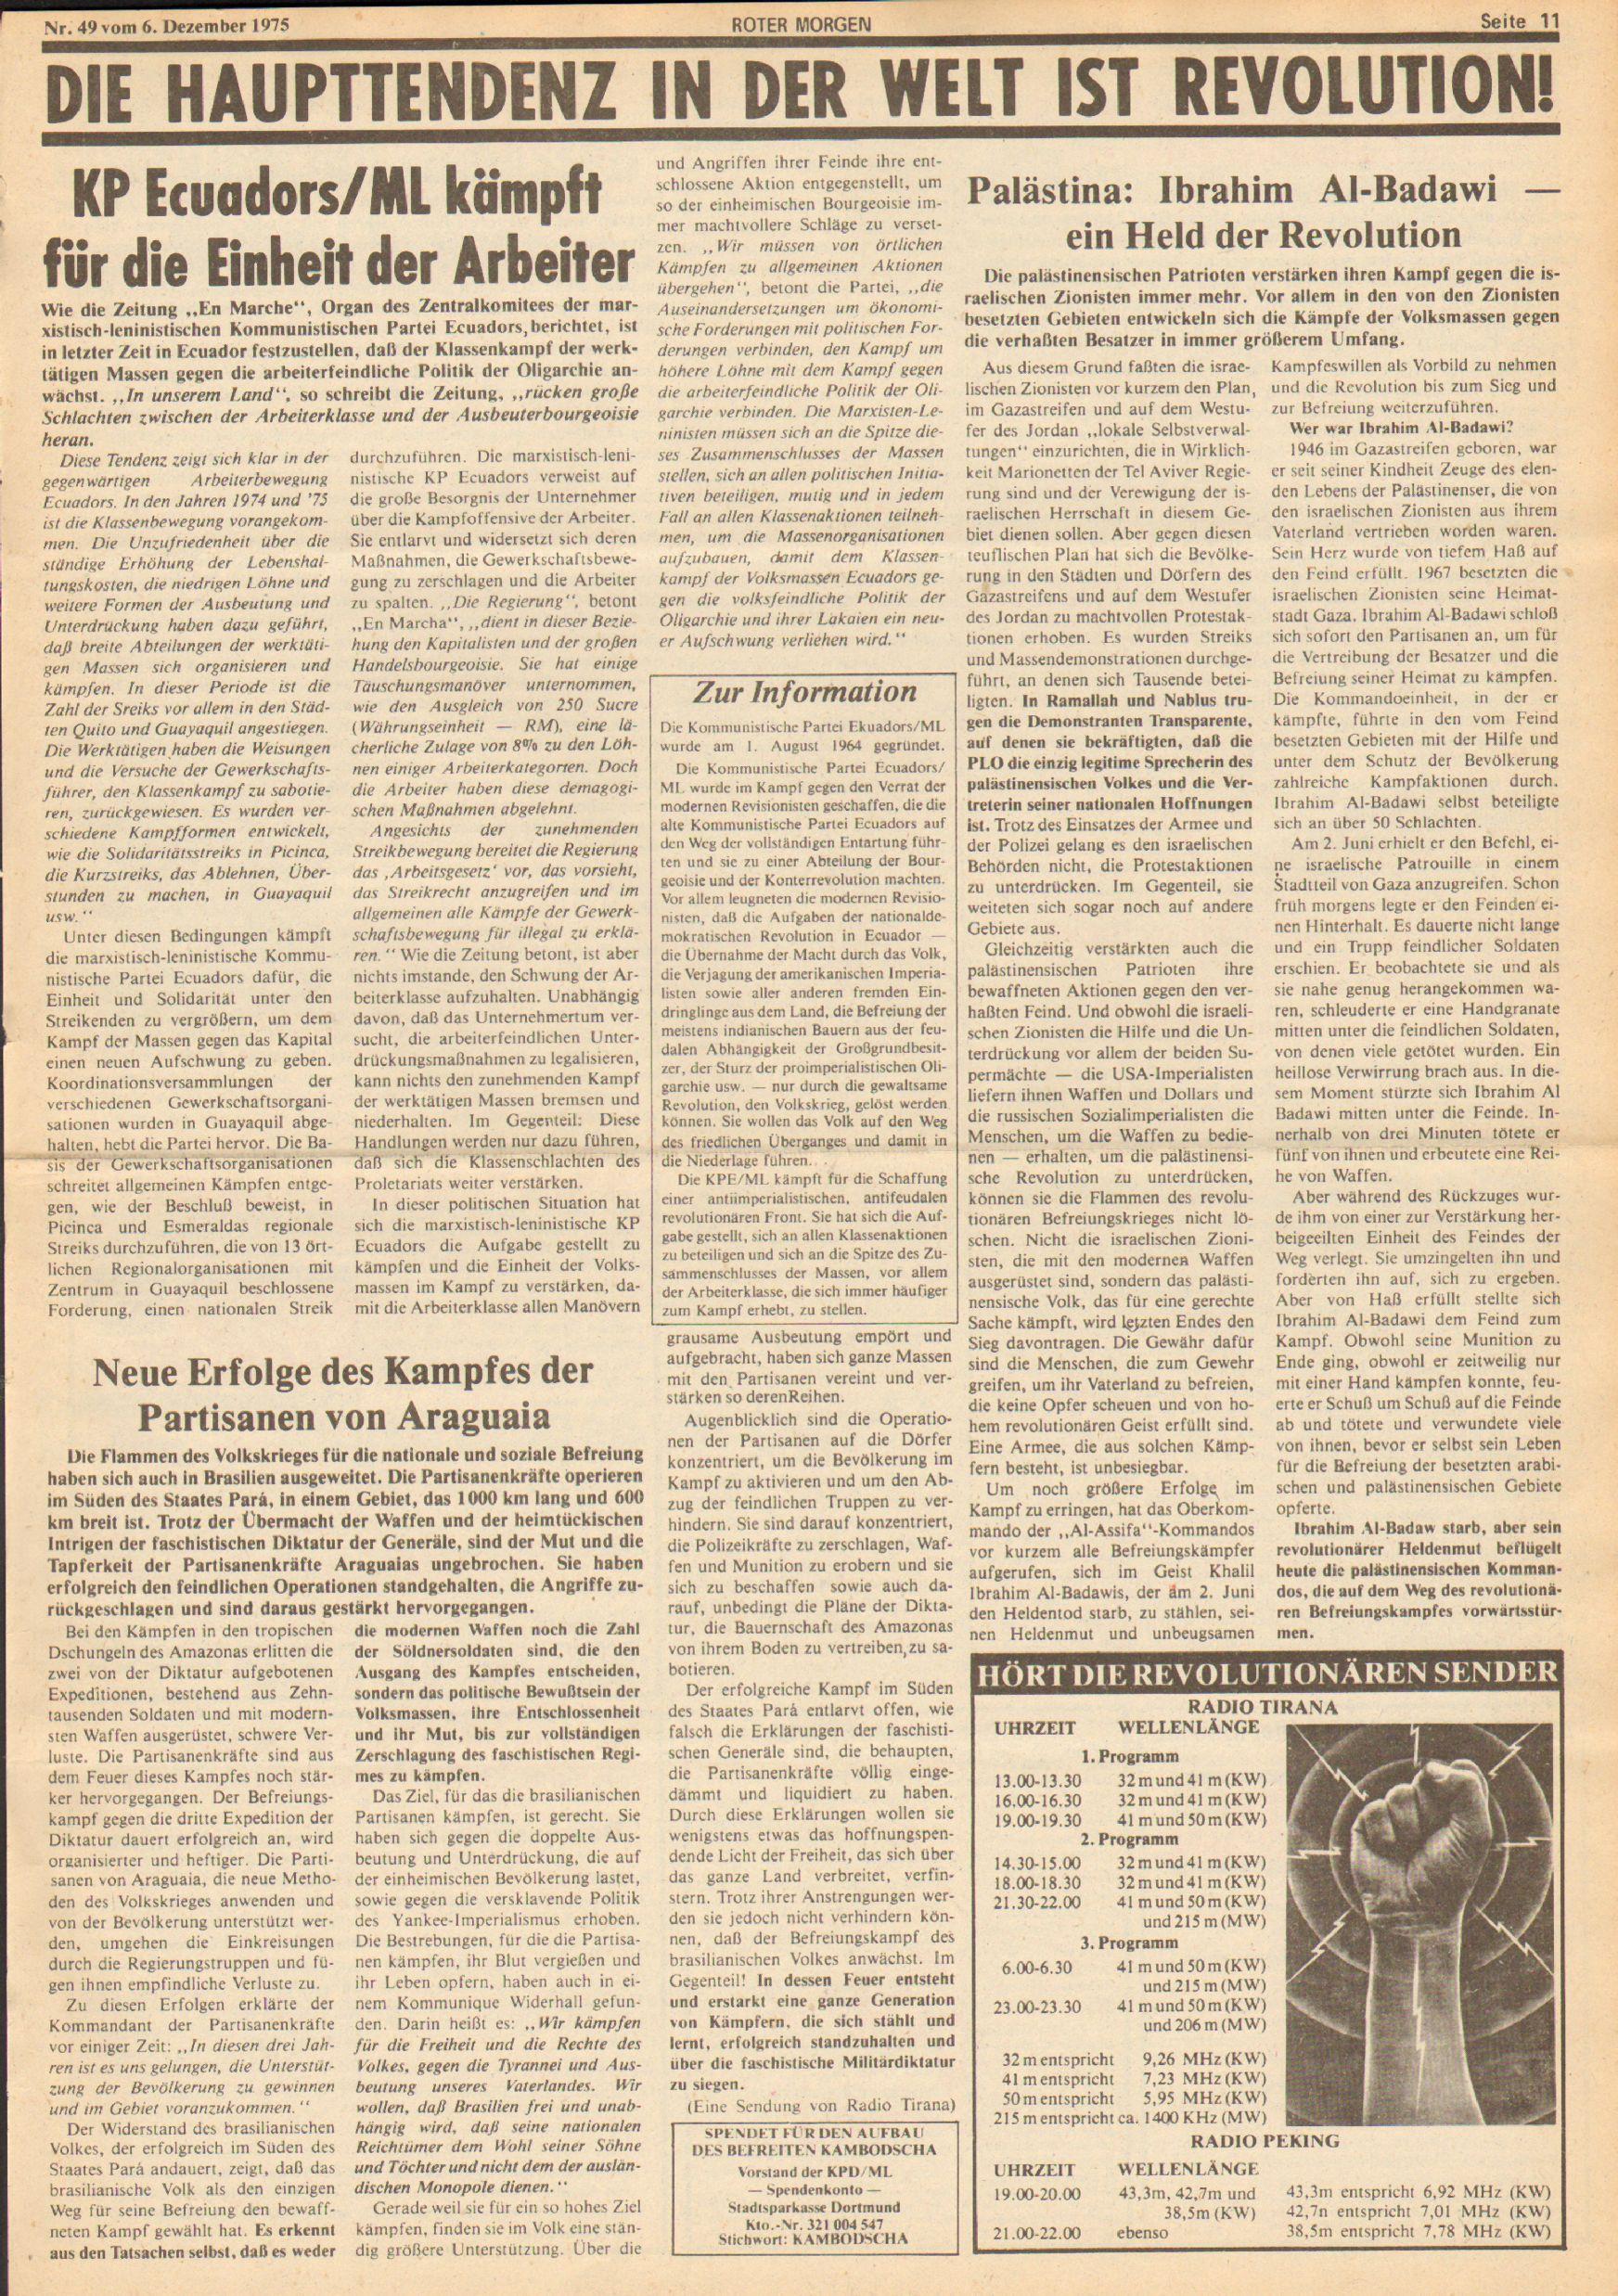 Roter Morgen, 9. Jg., 6. Dezember 1975, Nr. 49, Seite 11